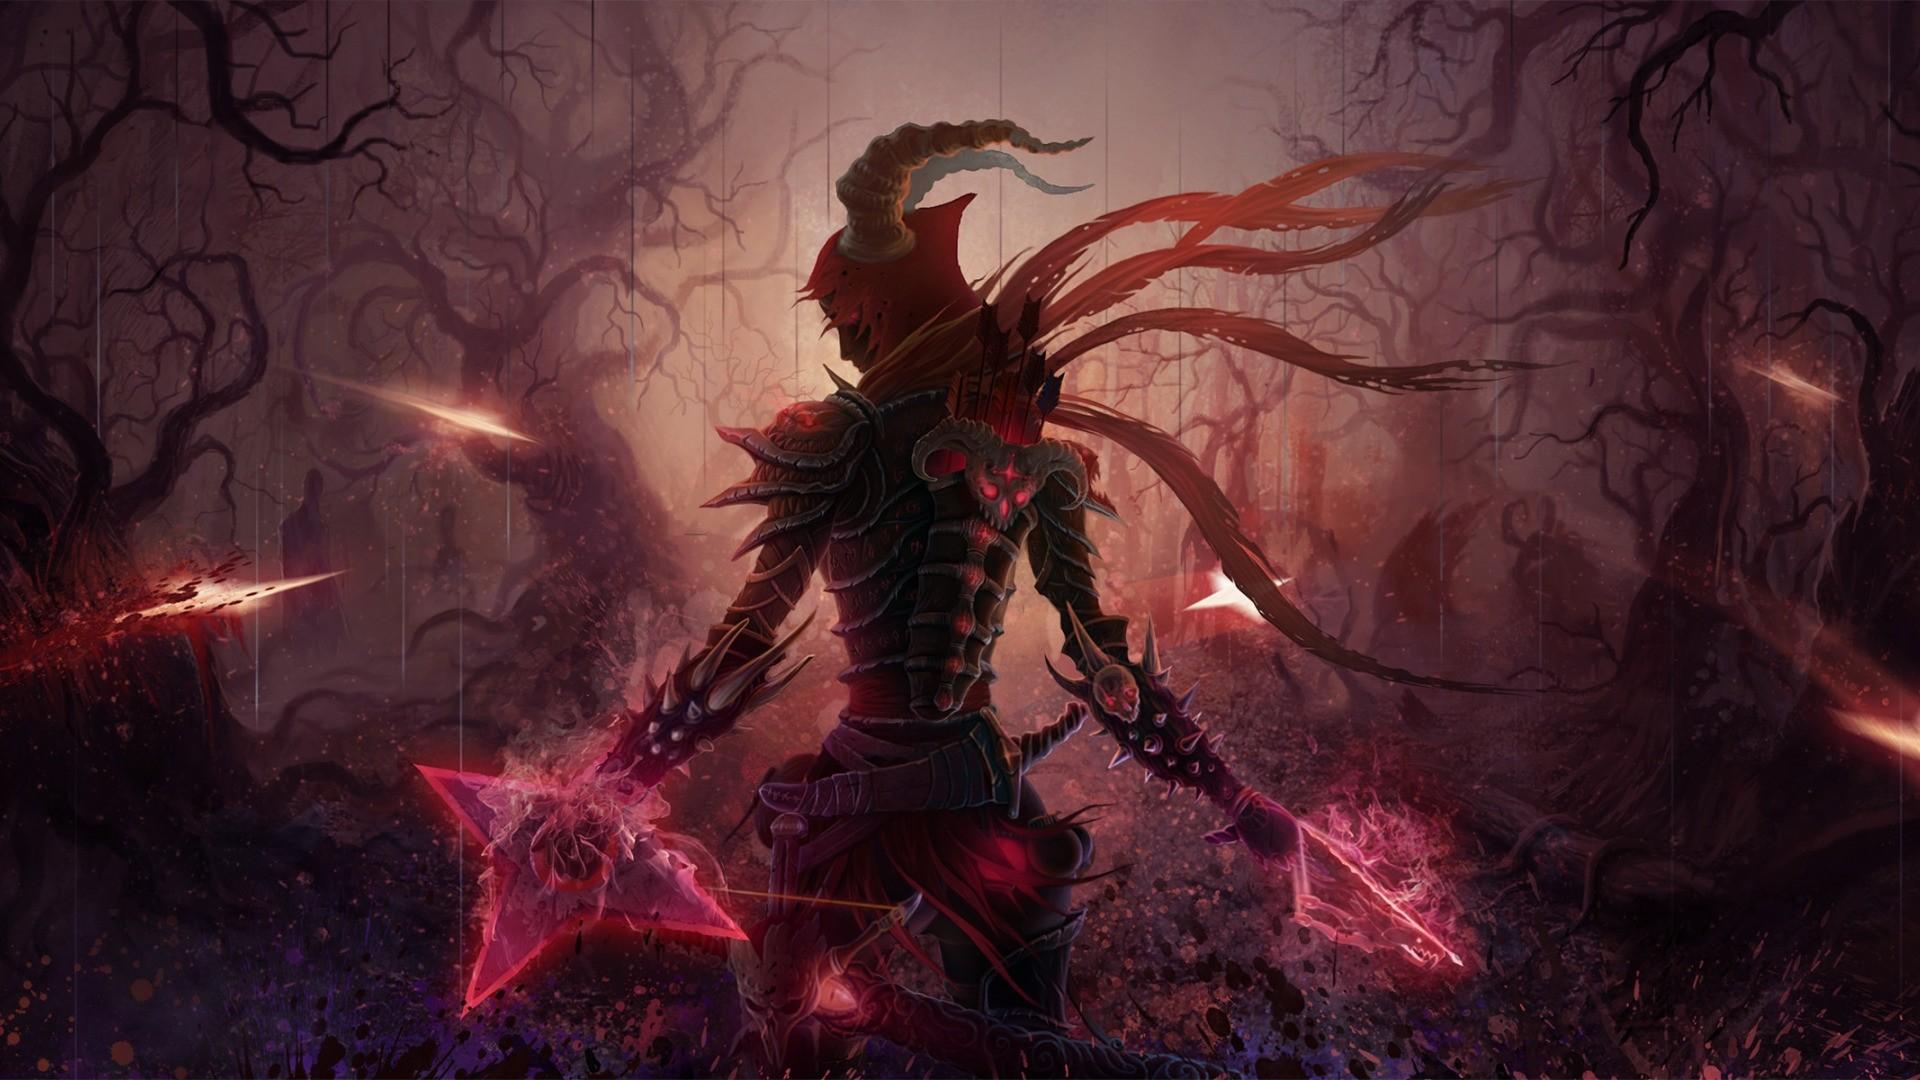 Demon Hunter Wallpaper Picture